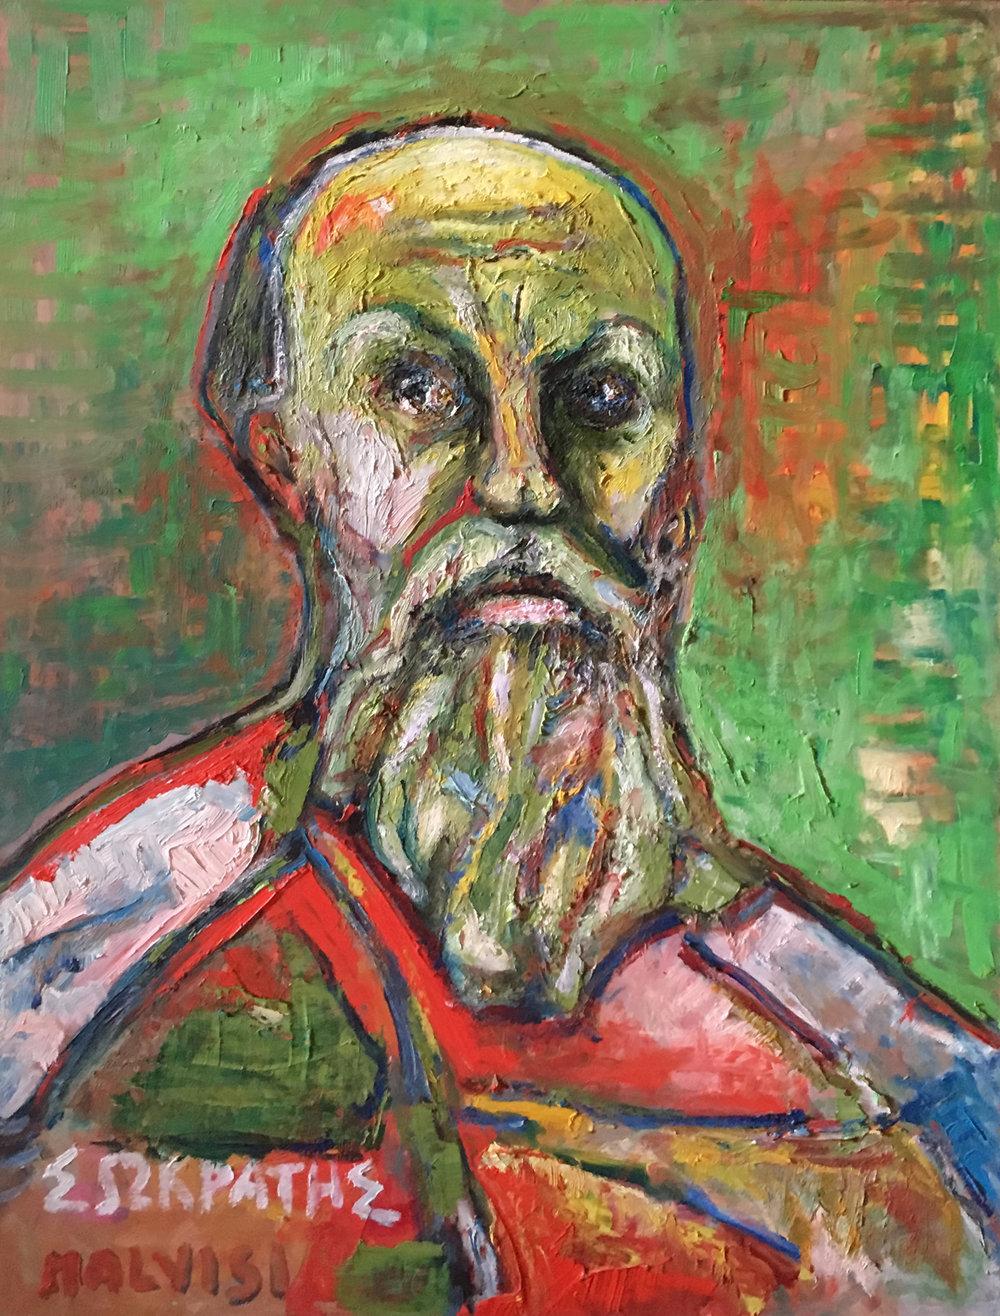 <b>Socrate</b><br> 2004 Oil on wood <br> cm 50 x 70